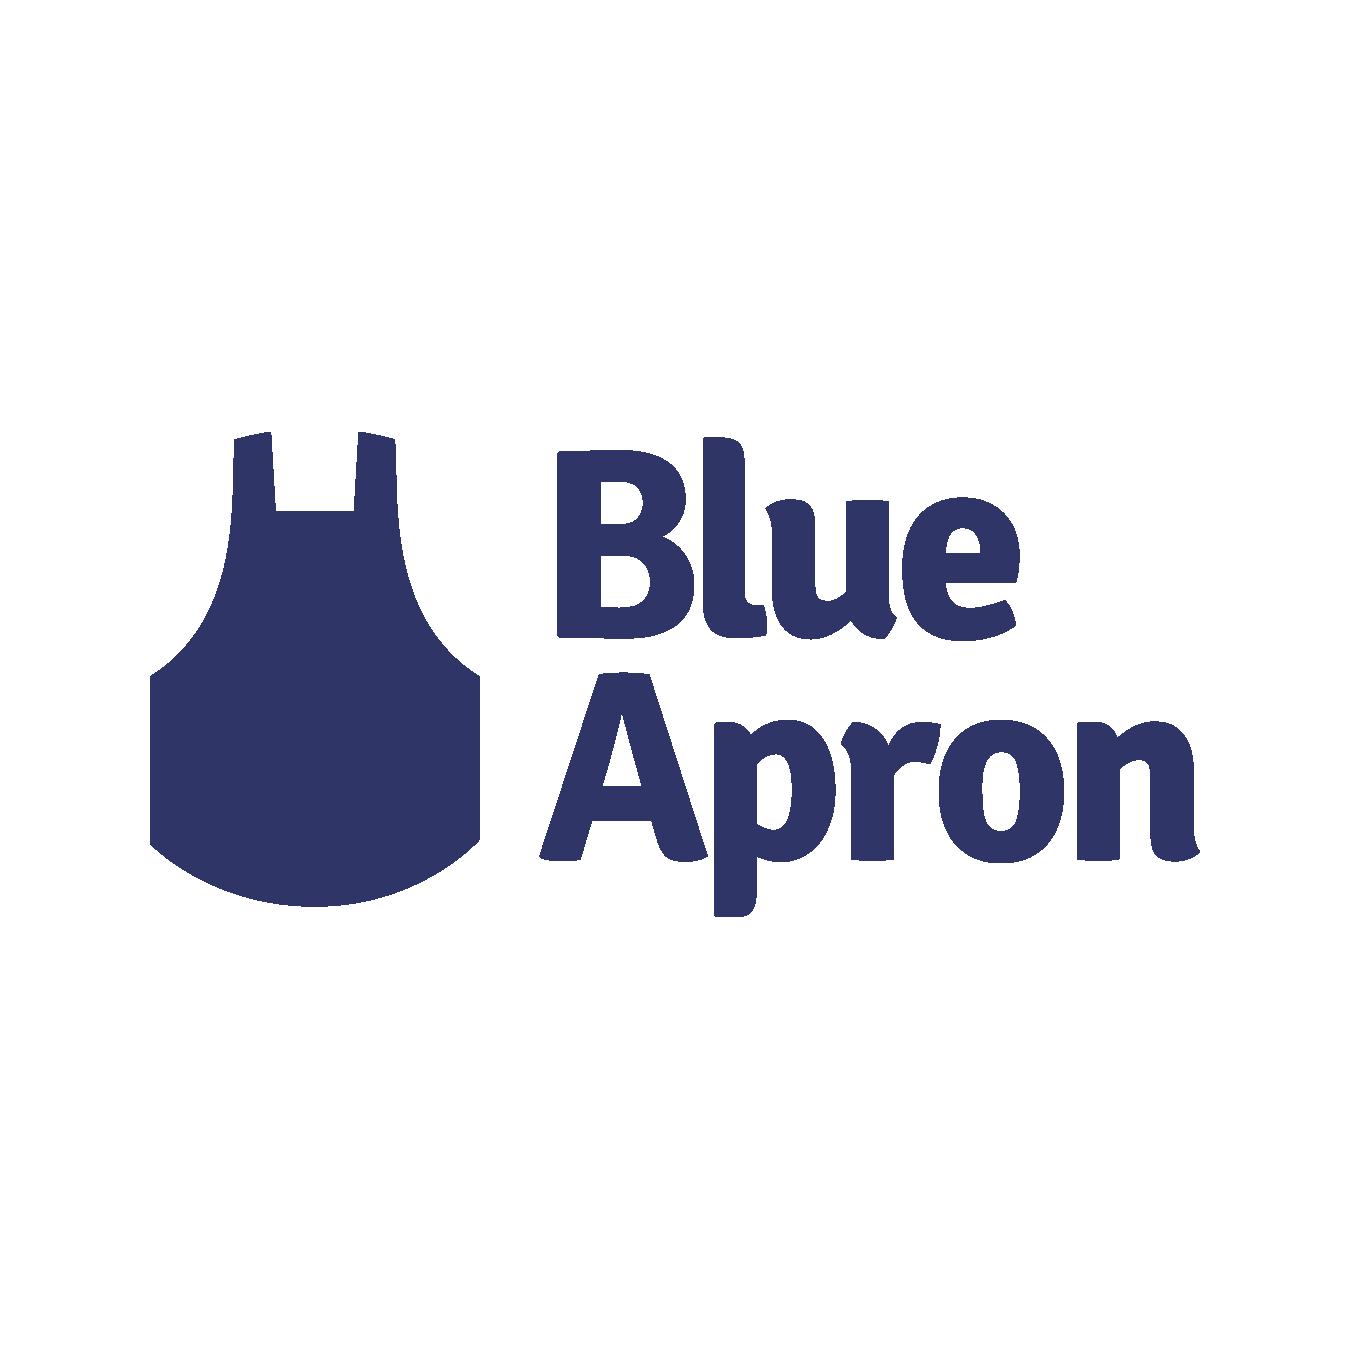 blue-apron-logo-png-5